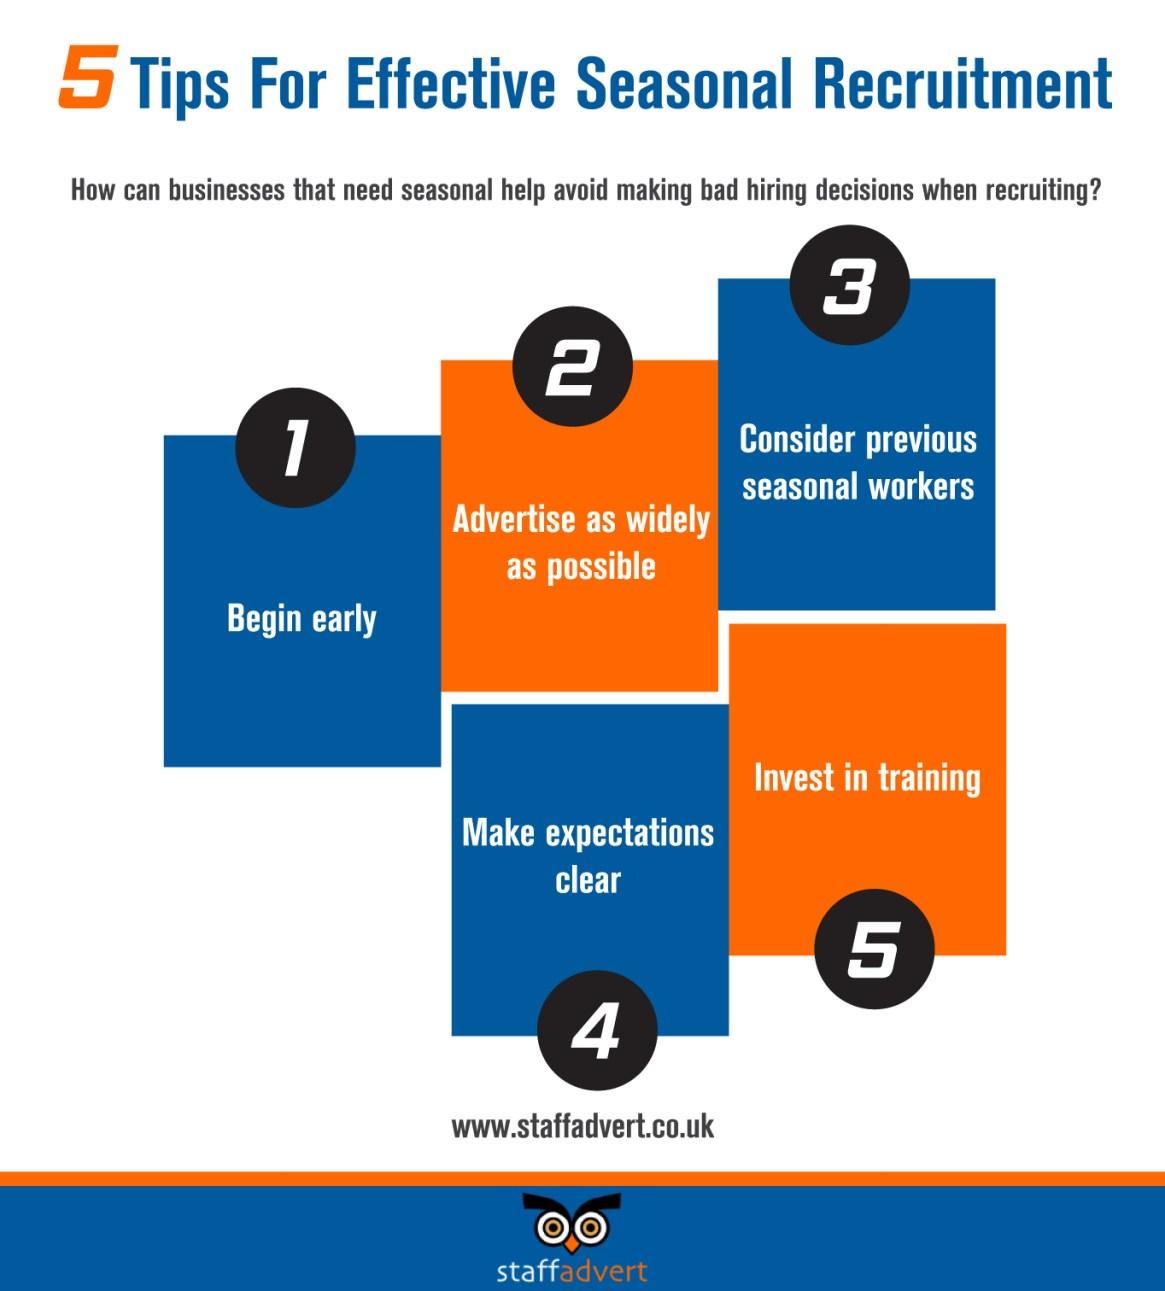 5 Tips For Effective Seasonal Recruitment